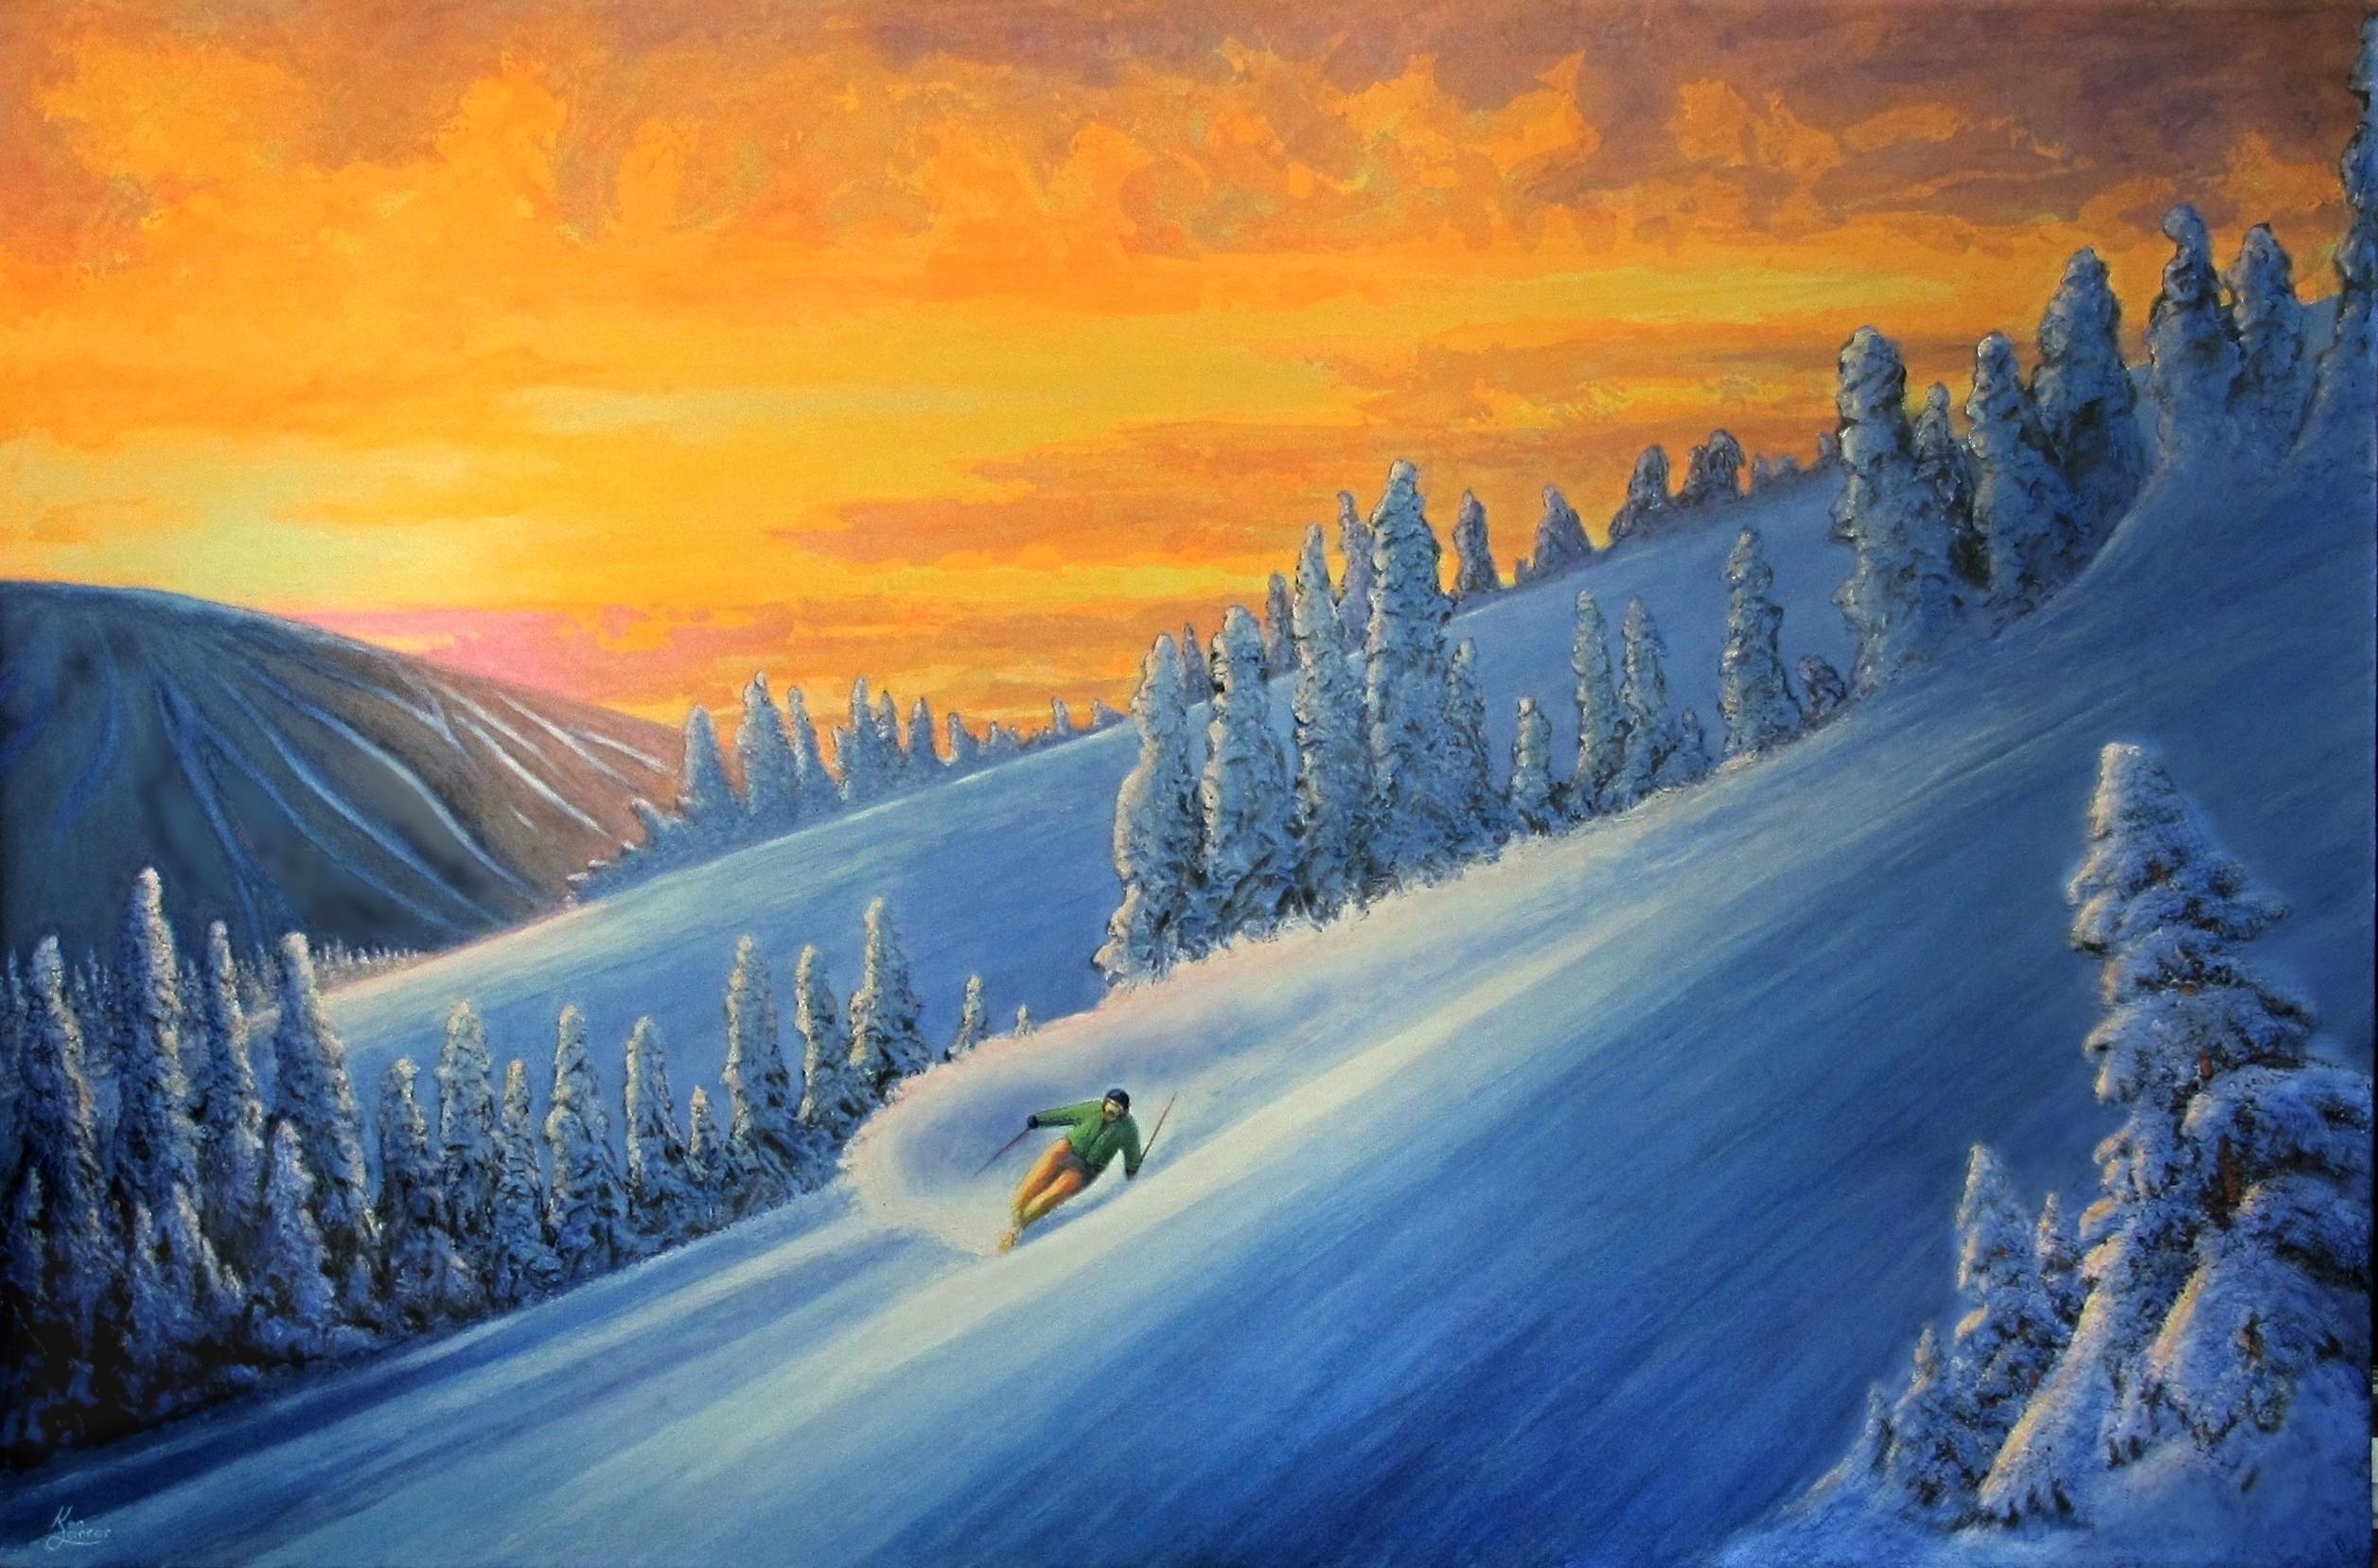 Sun Peaks Skier